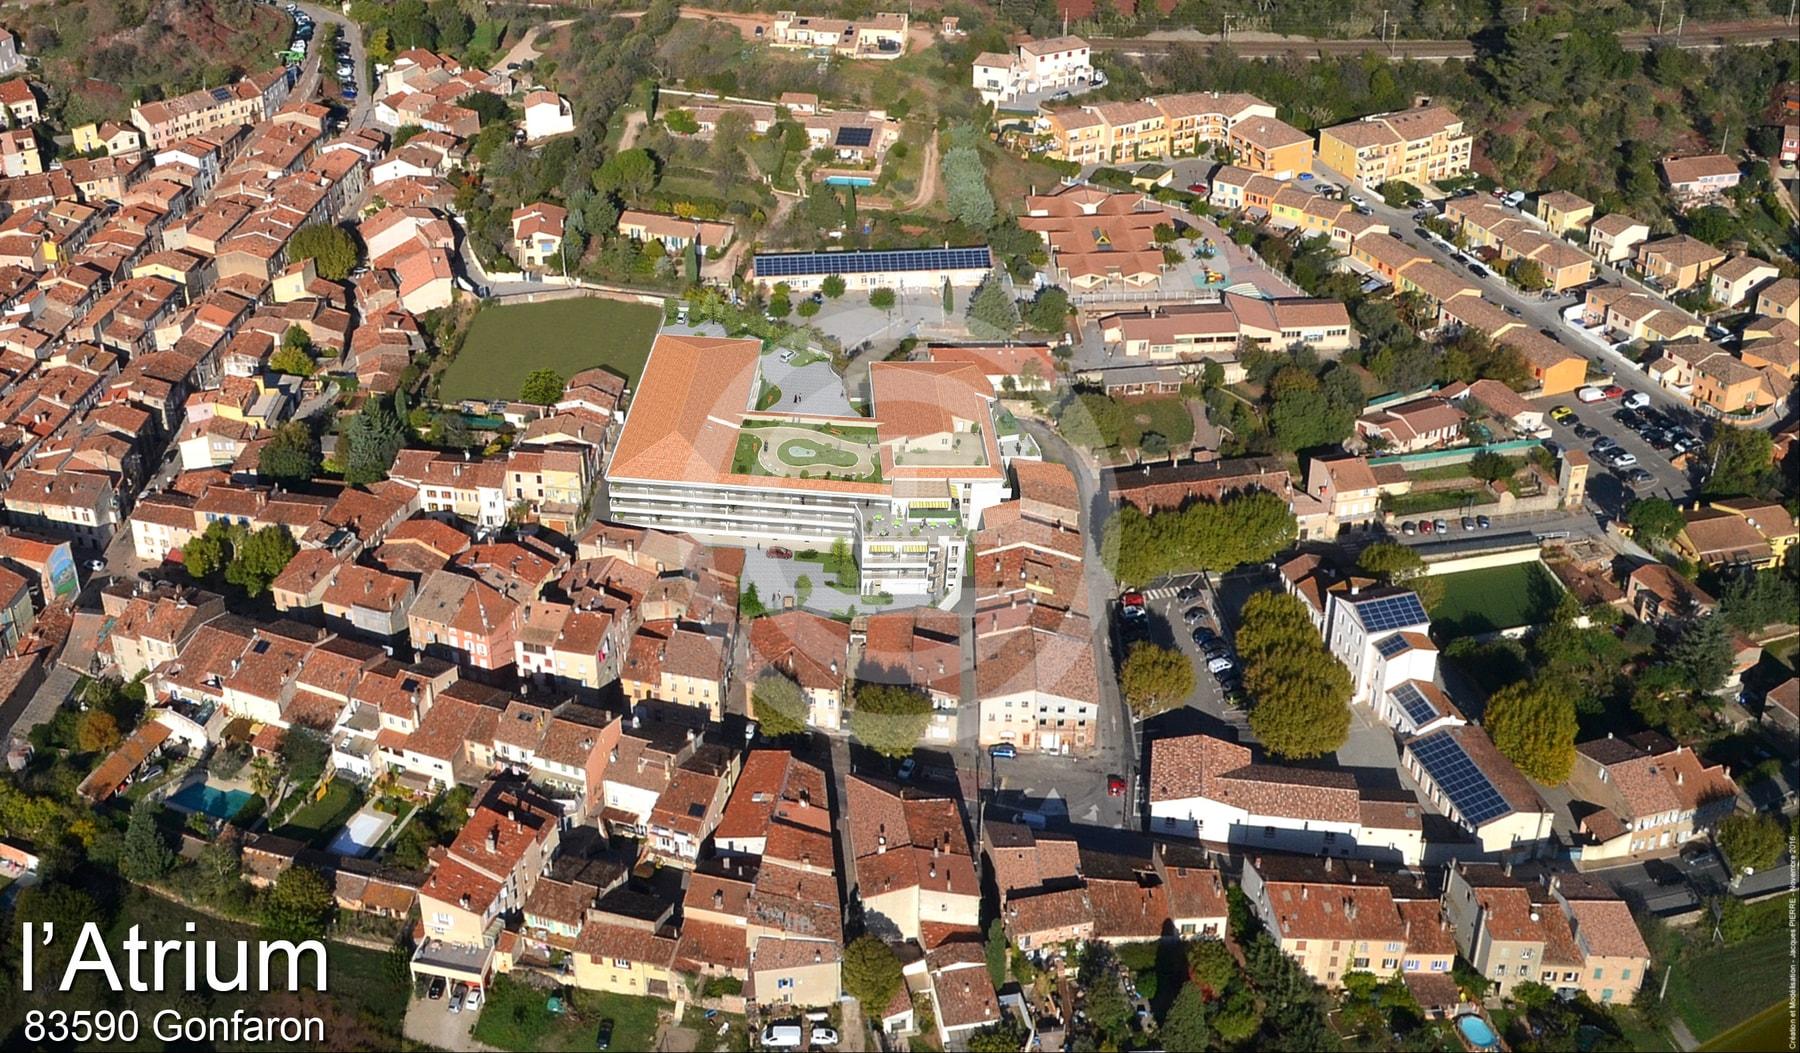 L'Atrium酒店位置:Gonfaron村中心,距离大海和圣特罗佩(Saint Tropez)湾30公里